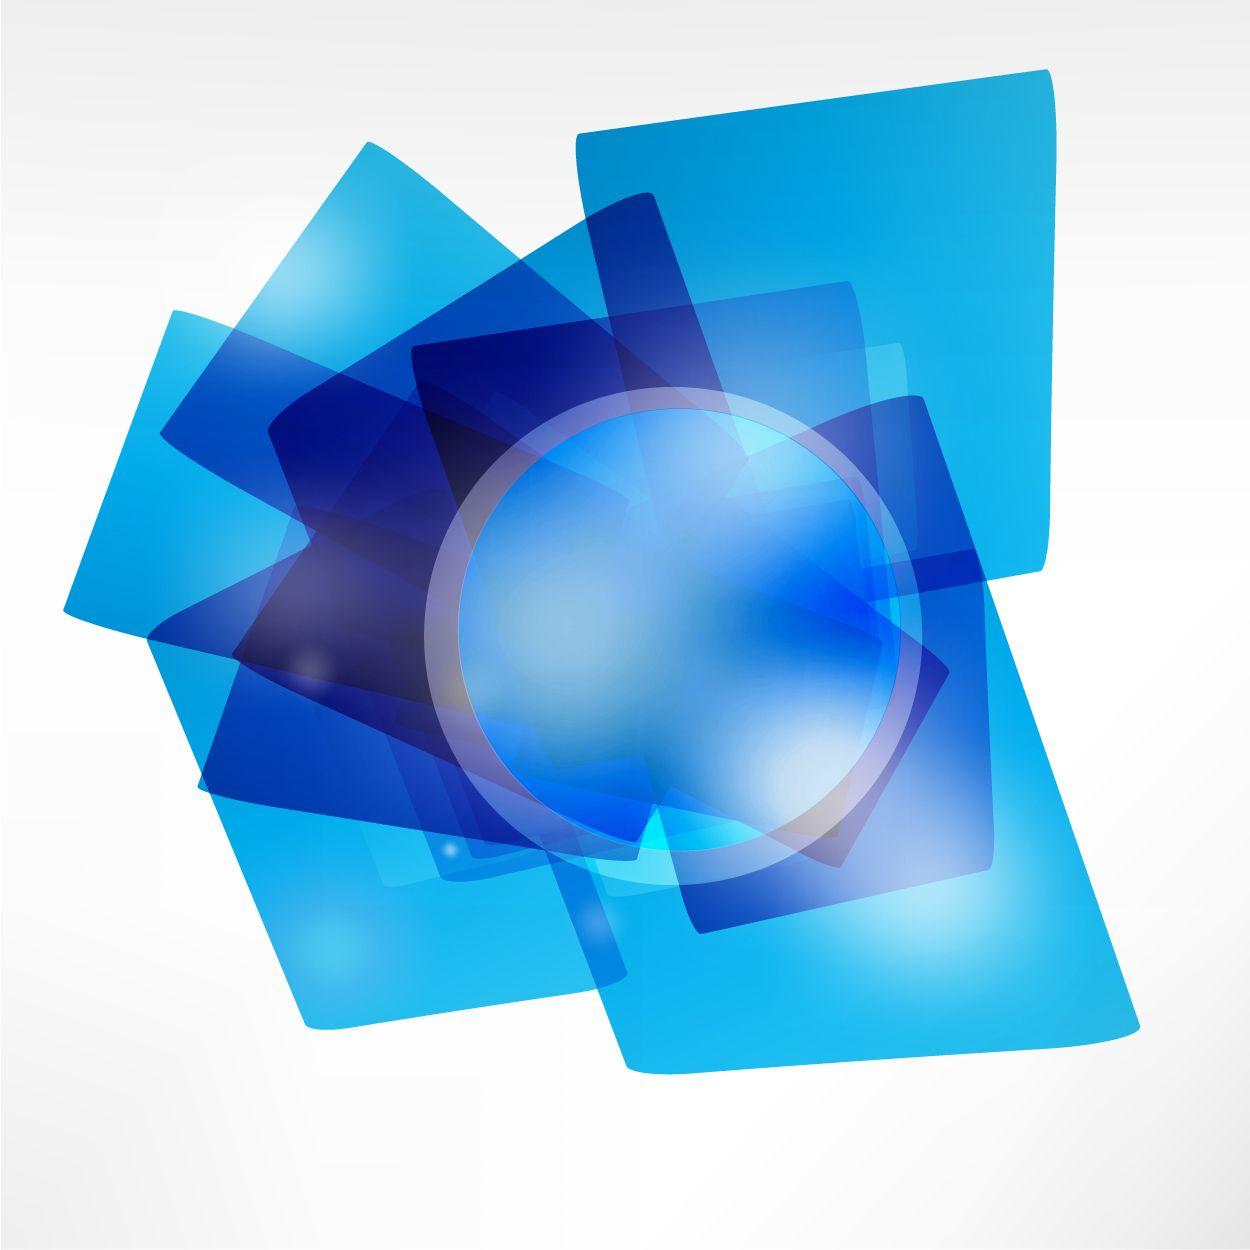 transparent blue geometric shape background - vector download